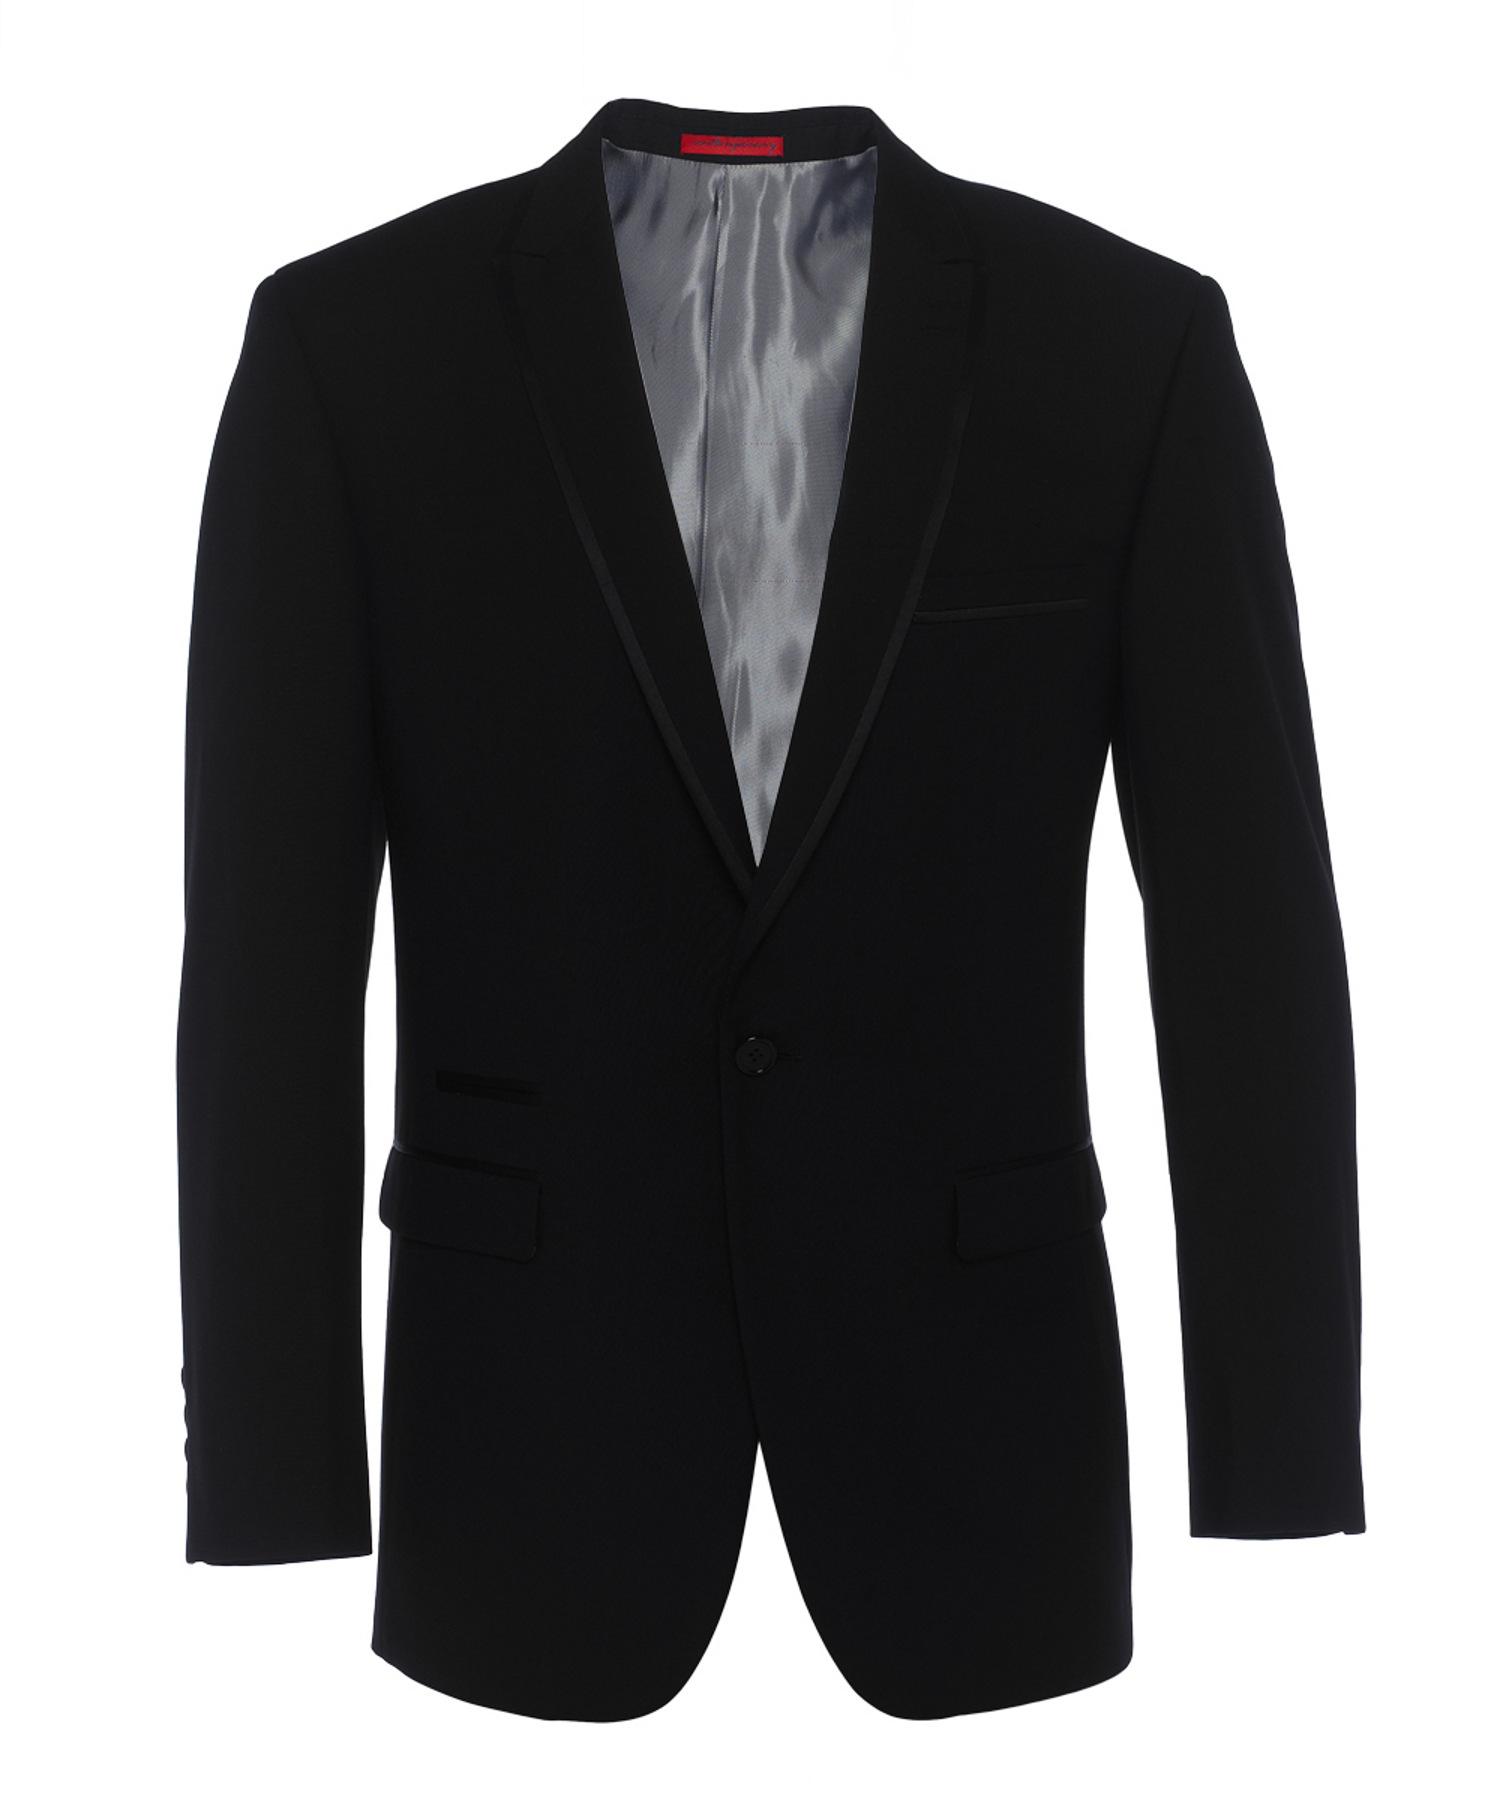 3 Piece Slim tuxedo